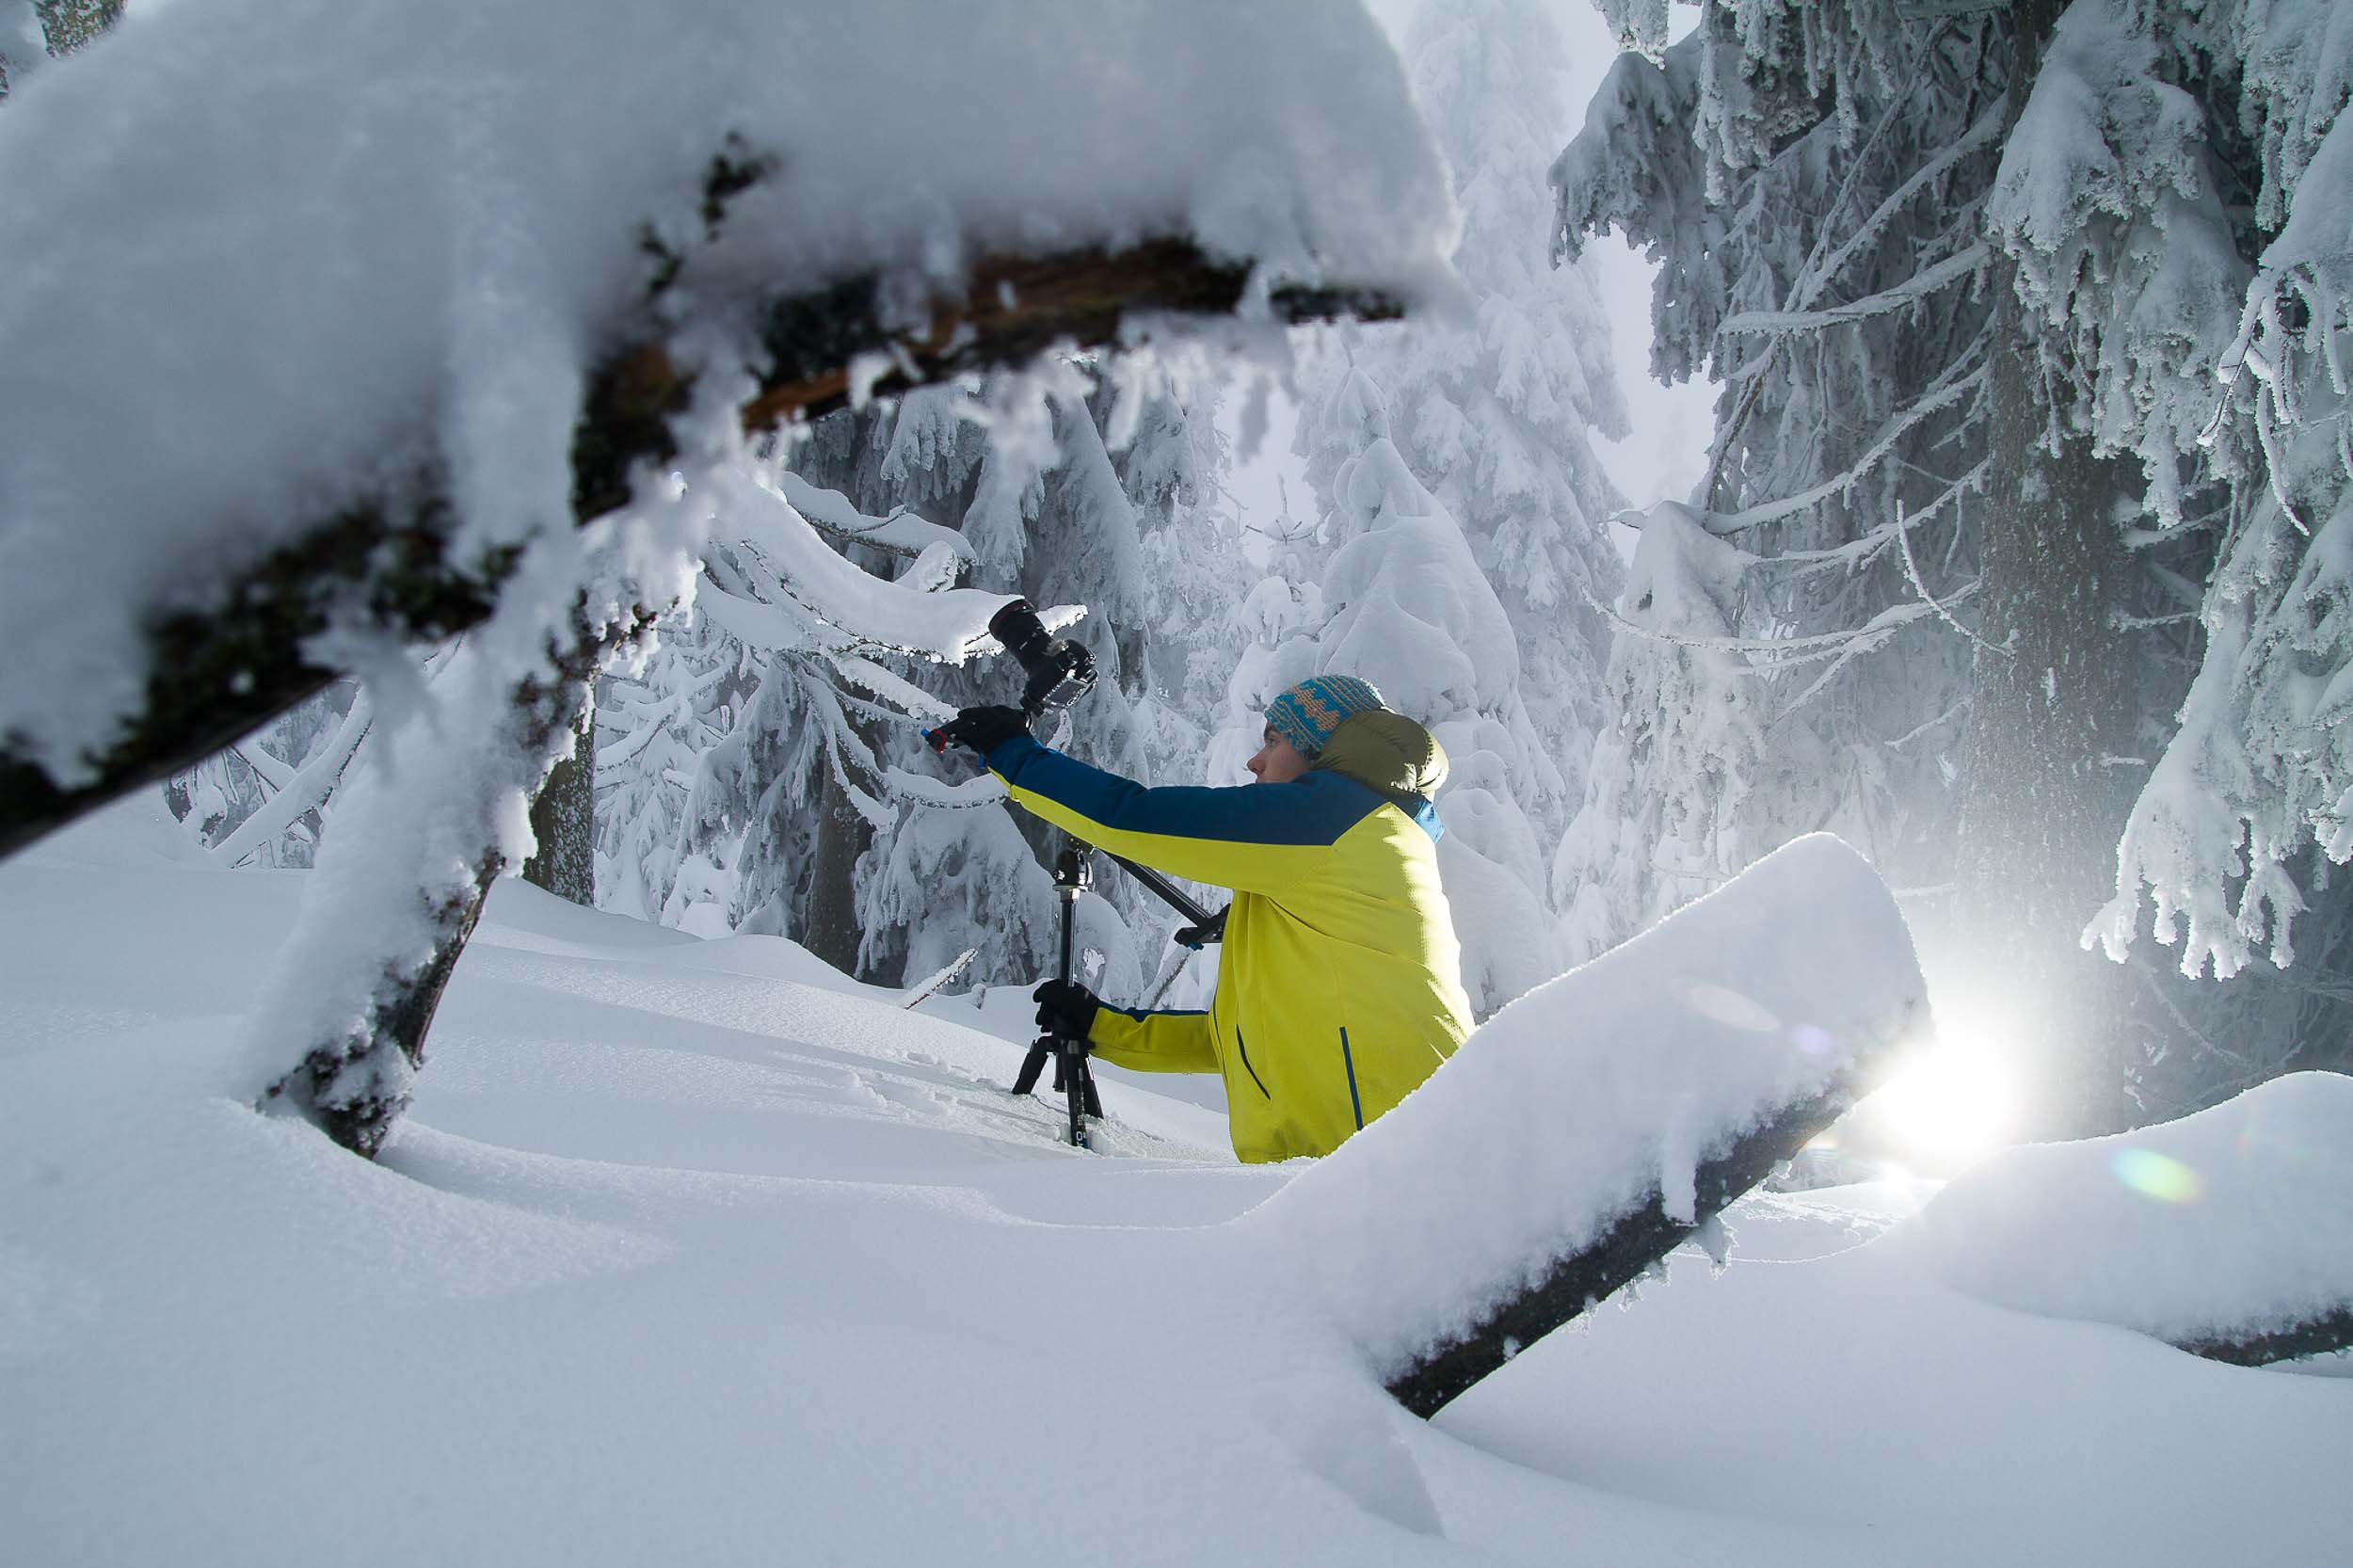 Dreharbeiten im Nationalpark Schwarzwald   Foto: Benjamin Blankenburg |  Download